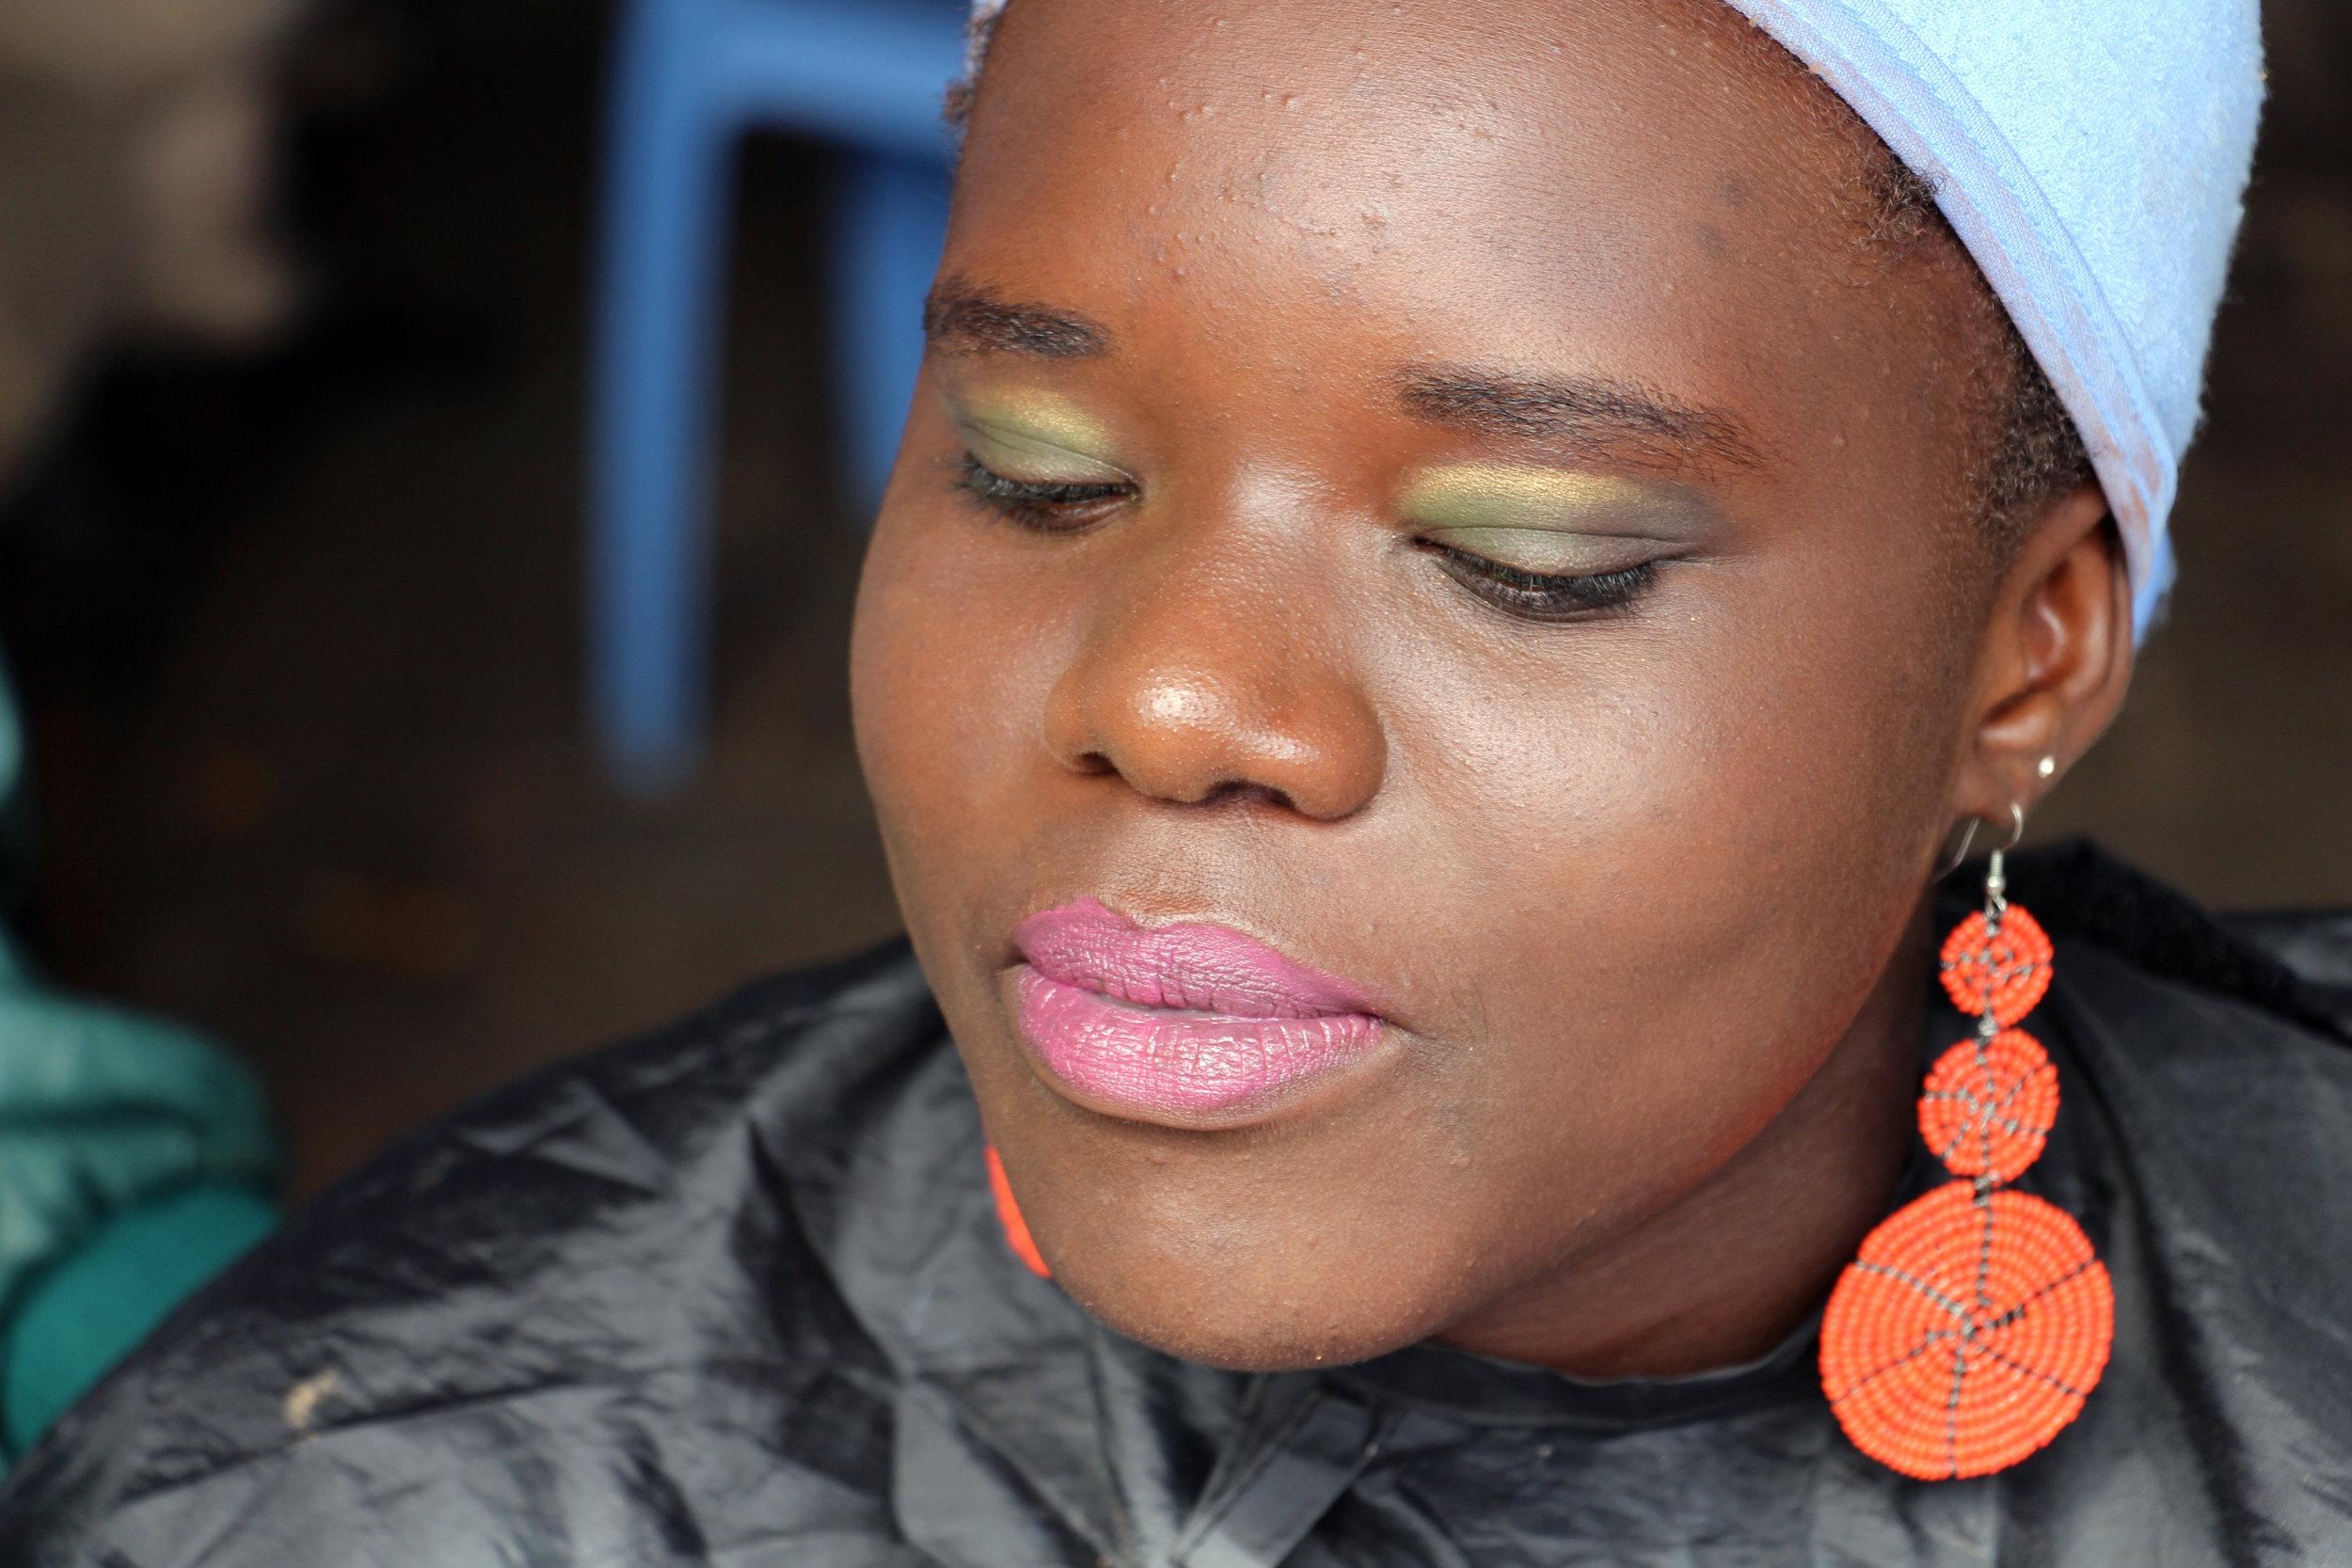 Kinthia in makeup.jpg